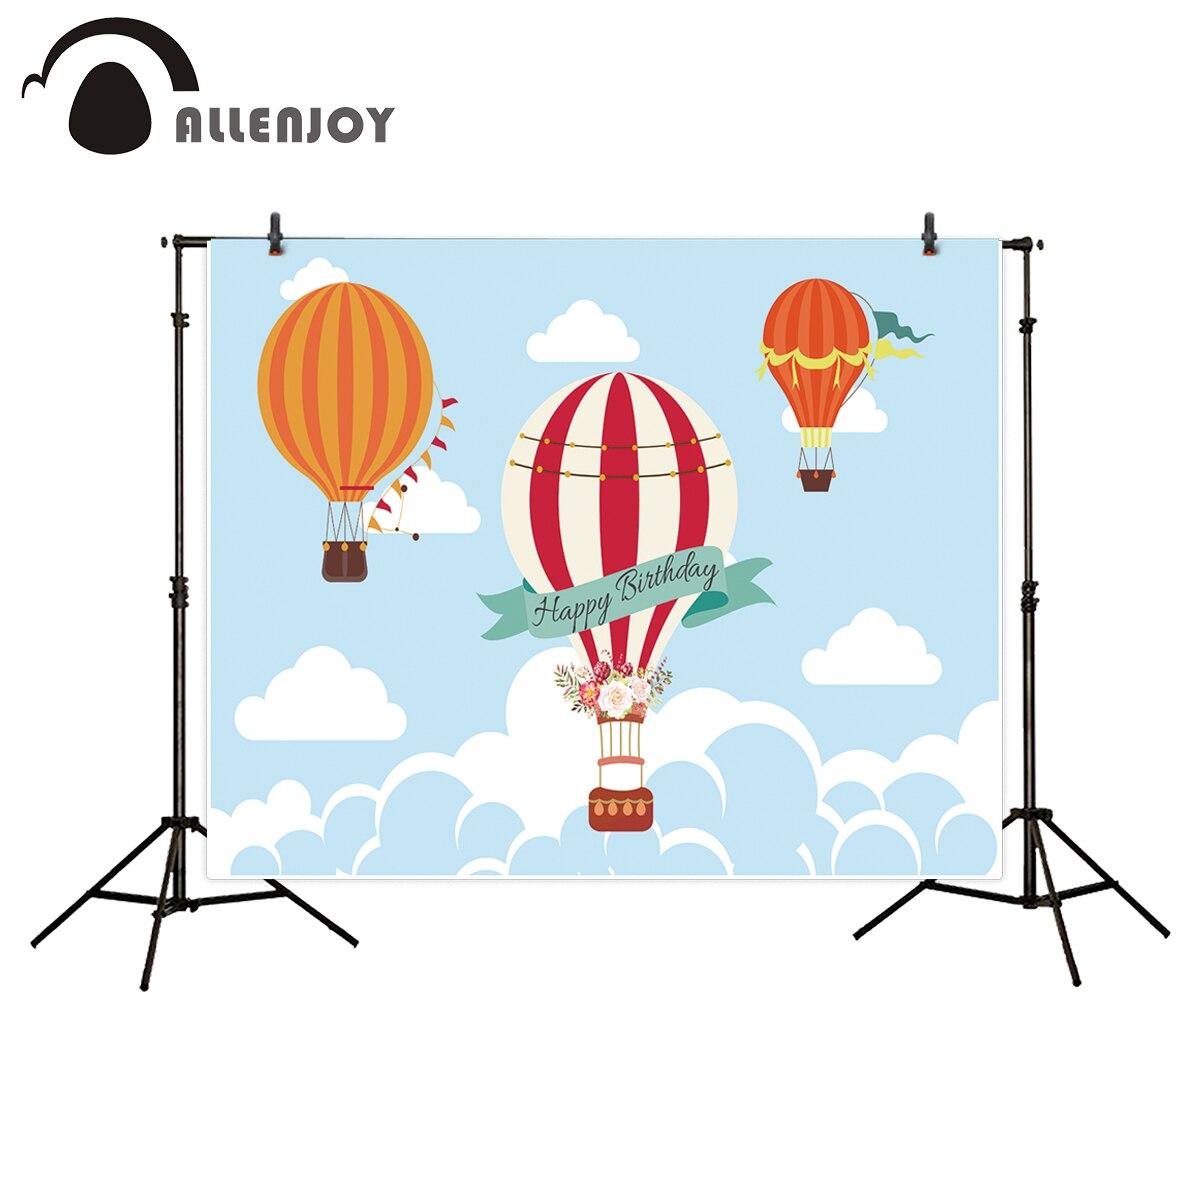 Allenjoy photography backdrop Sky blue hot air balloon child birthday celebration new background photocall customize photo print allenjoy children birthday celebration